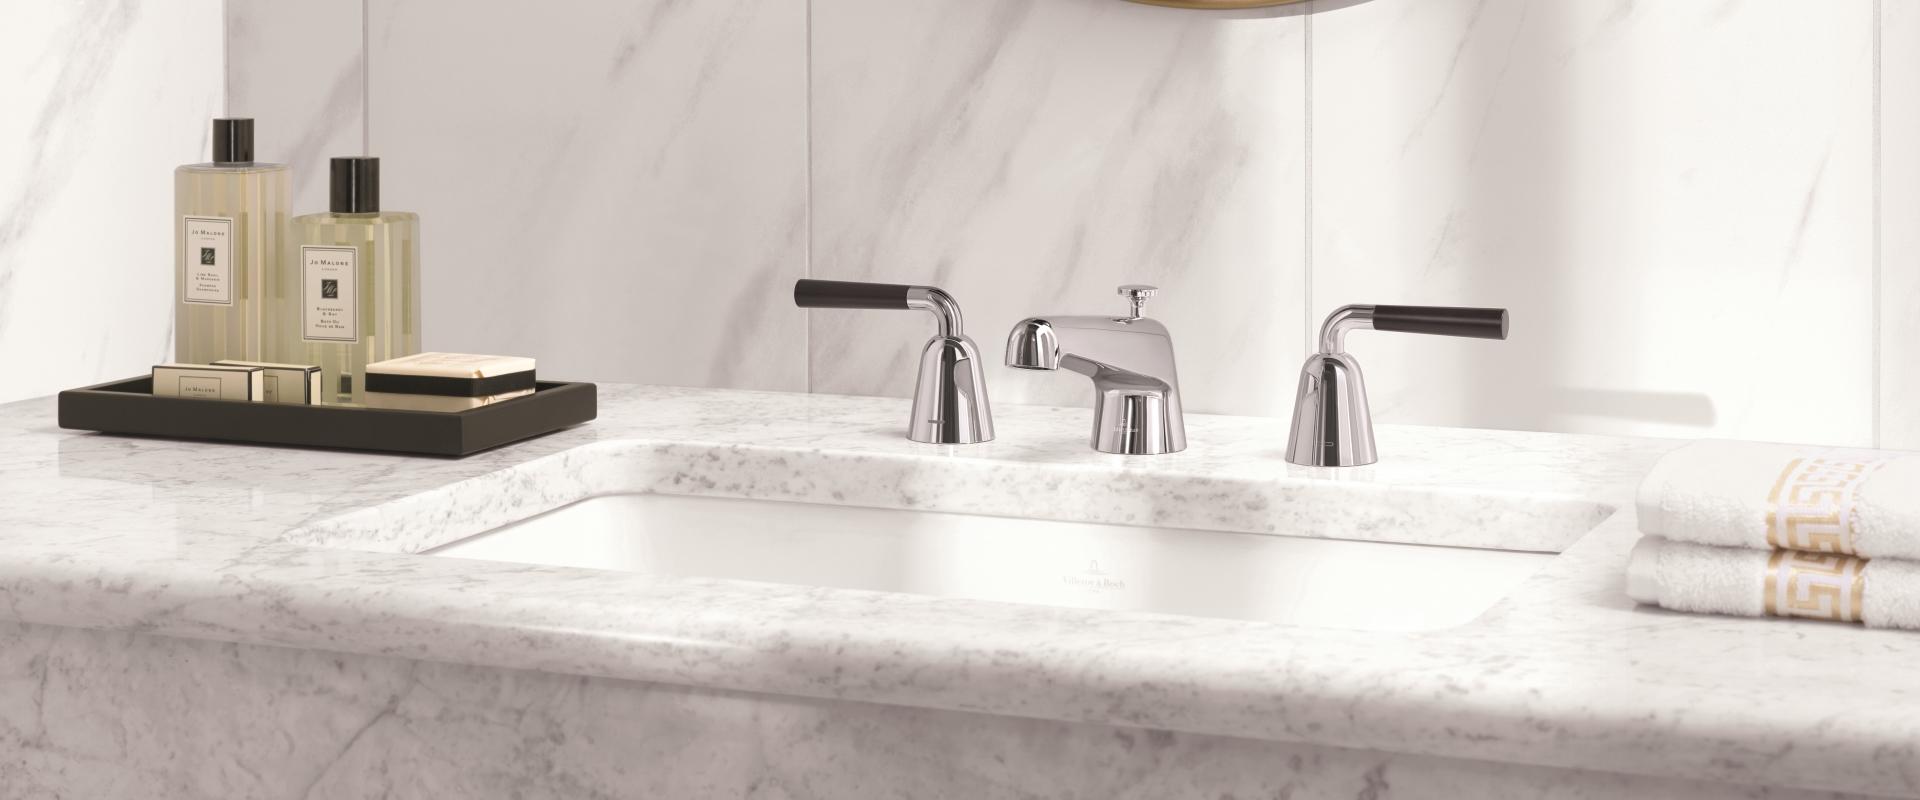 la collection domicil de villeroy boch. Black Bedroom Furniture Sets. Home Design Ideas